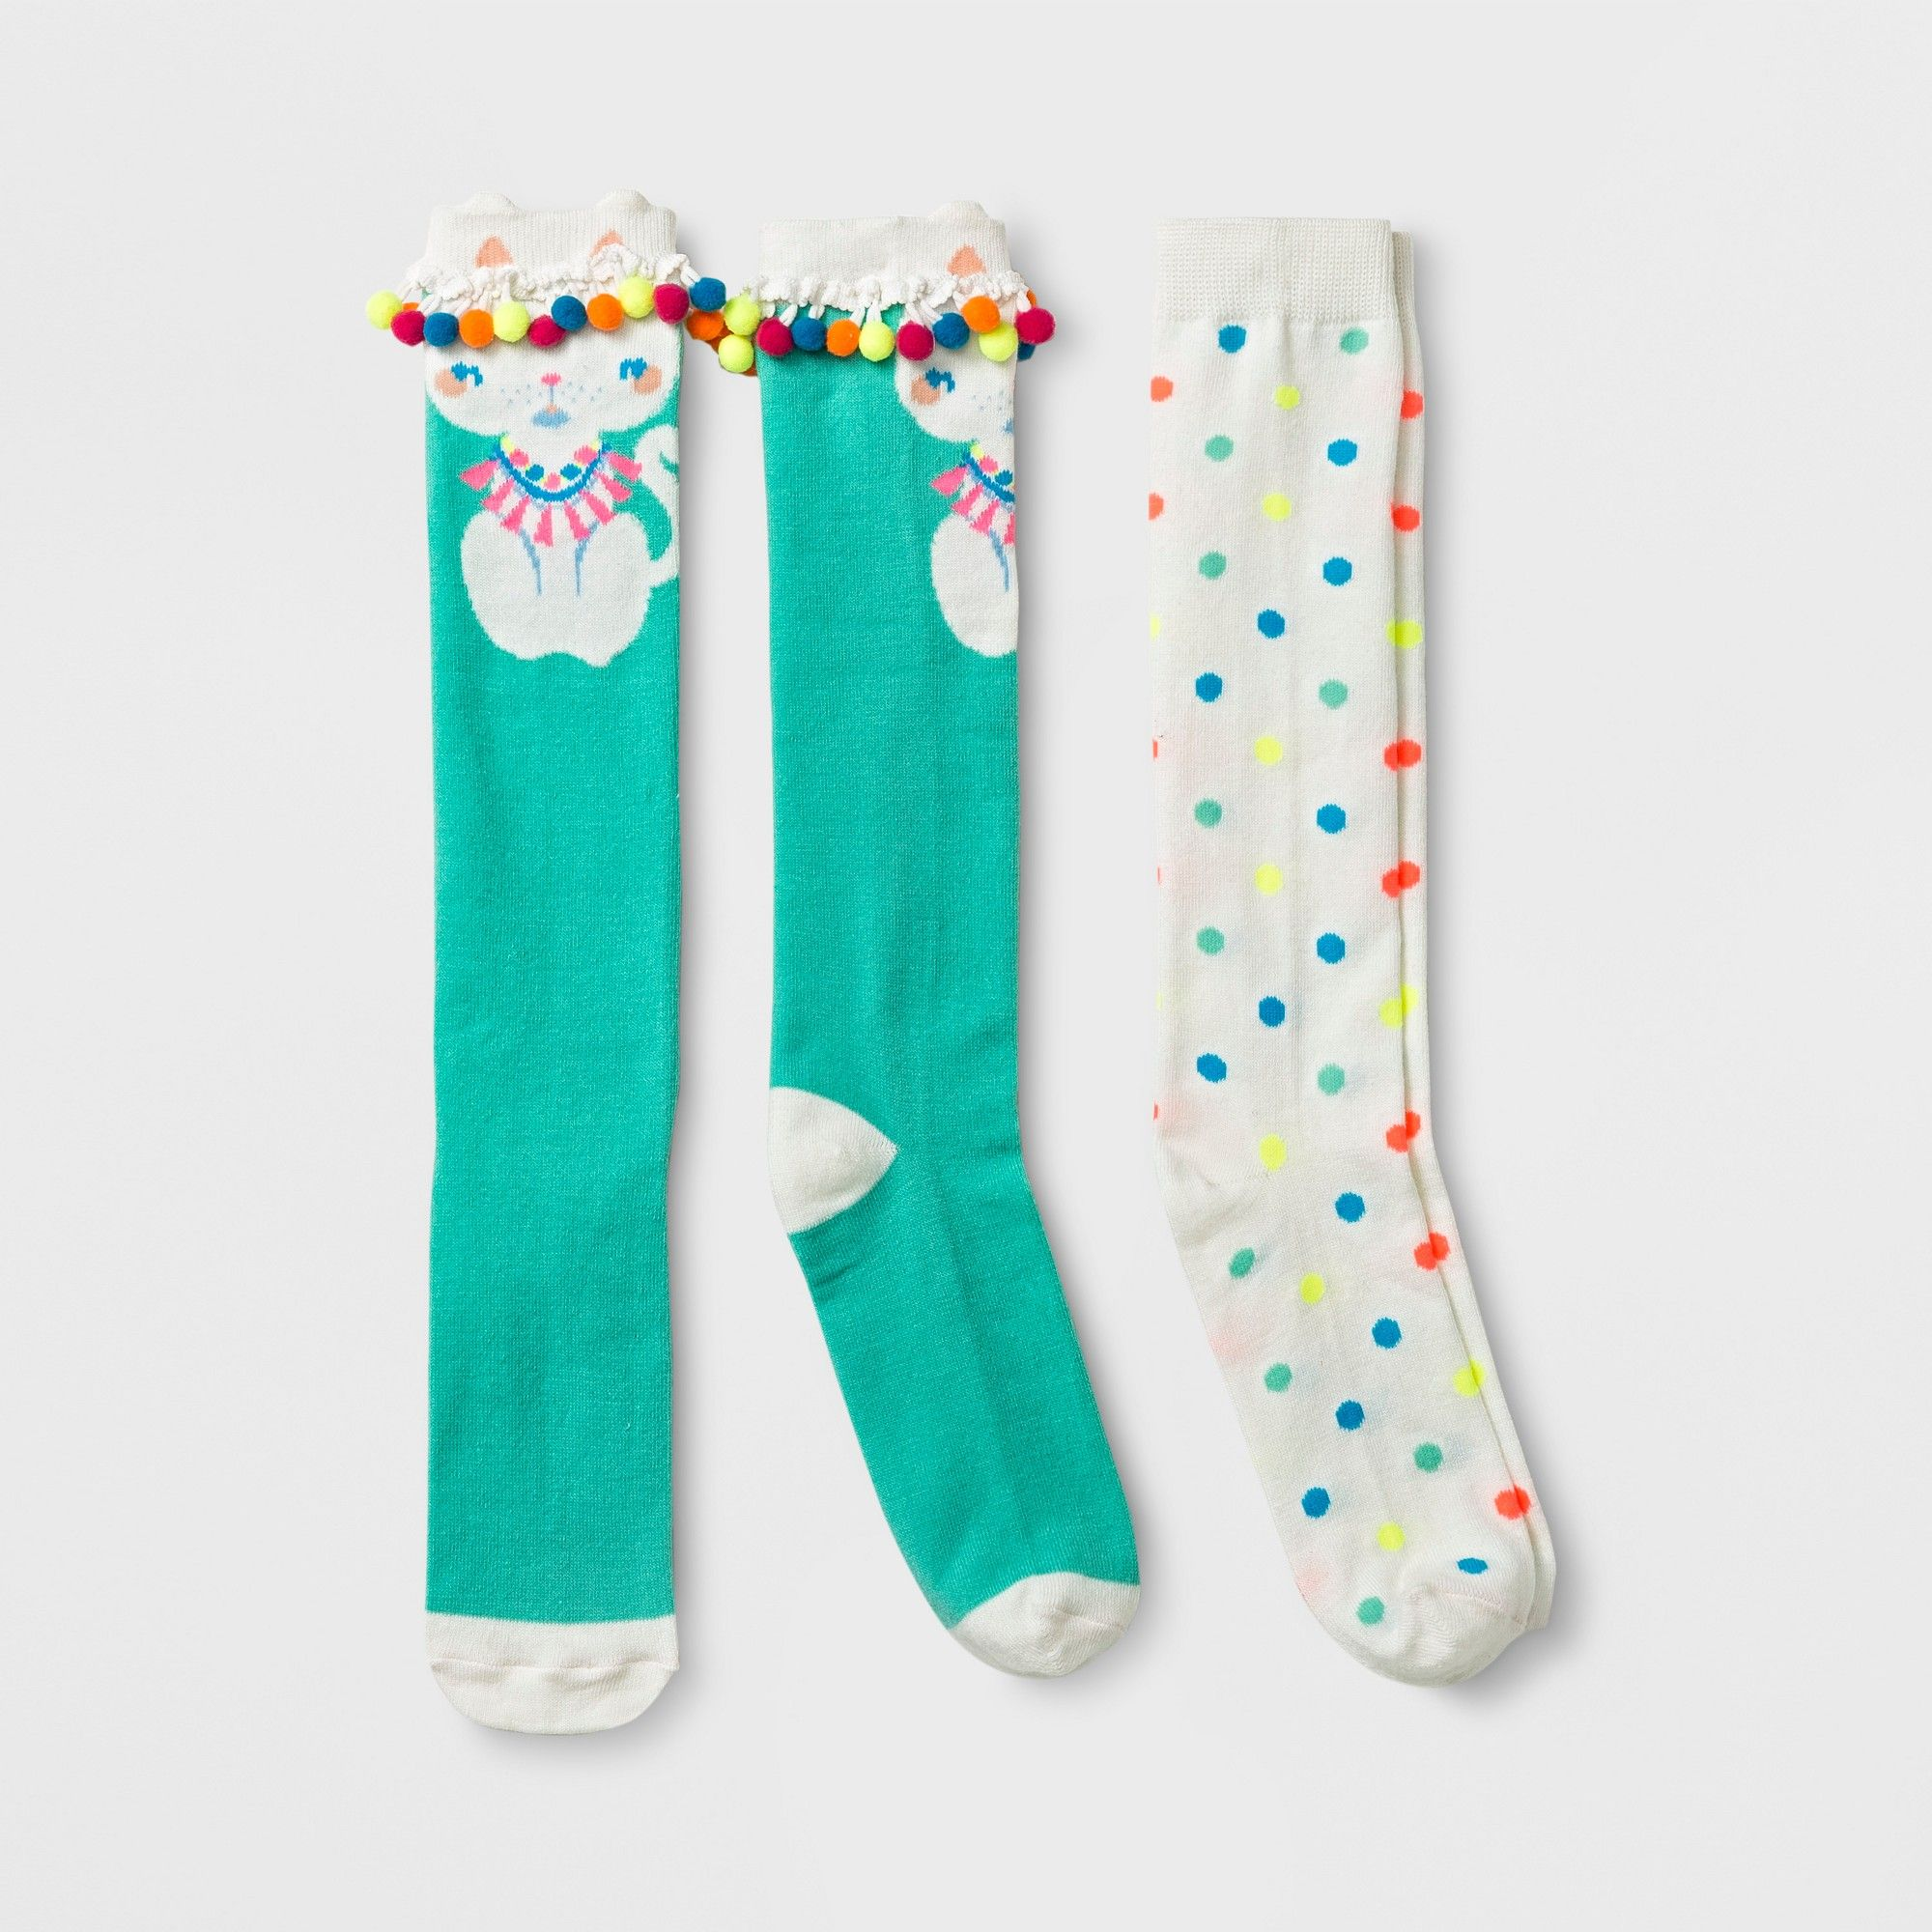 Hula Hooping Bunnies Sock It To Me Knee High Socks New Women 9-11 Rabbit Fashion